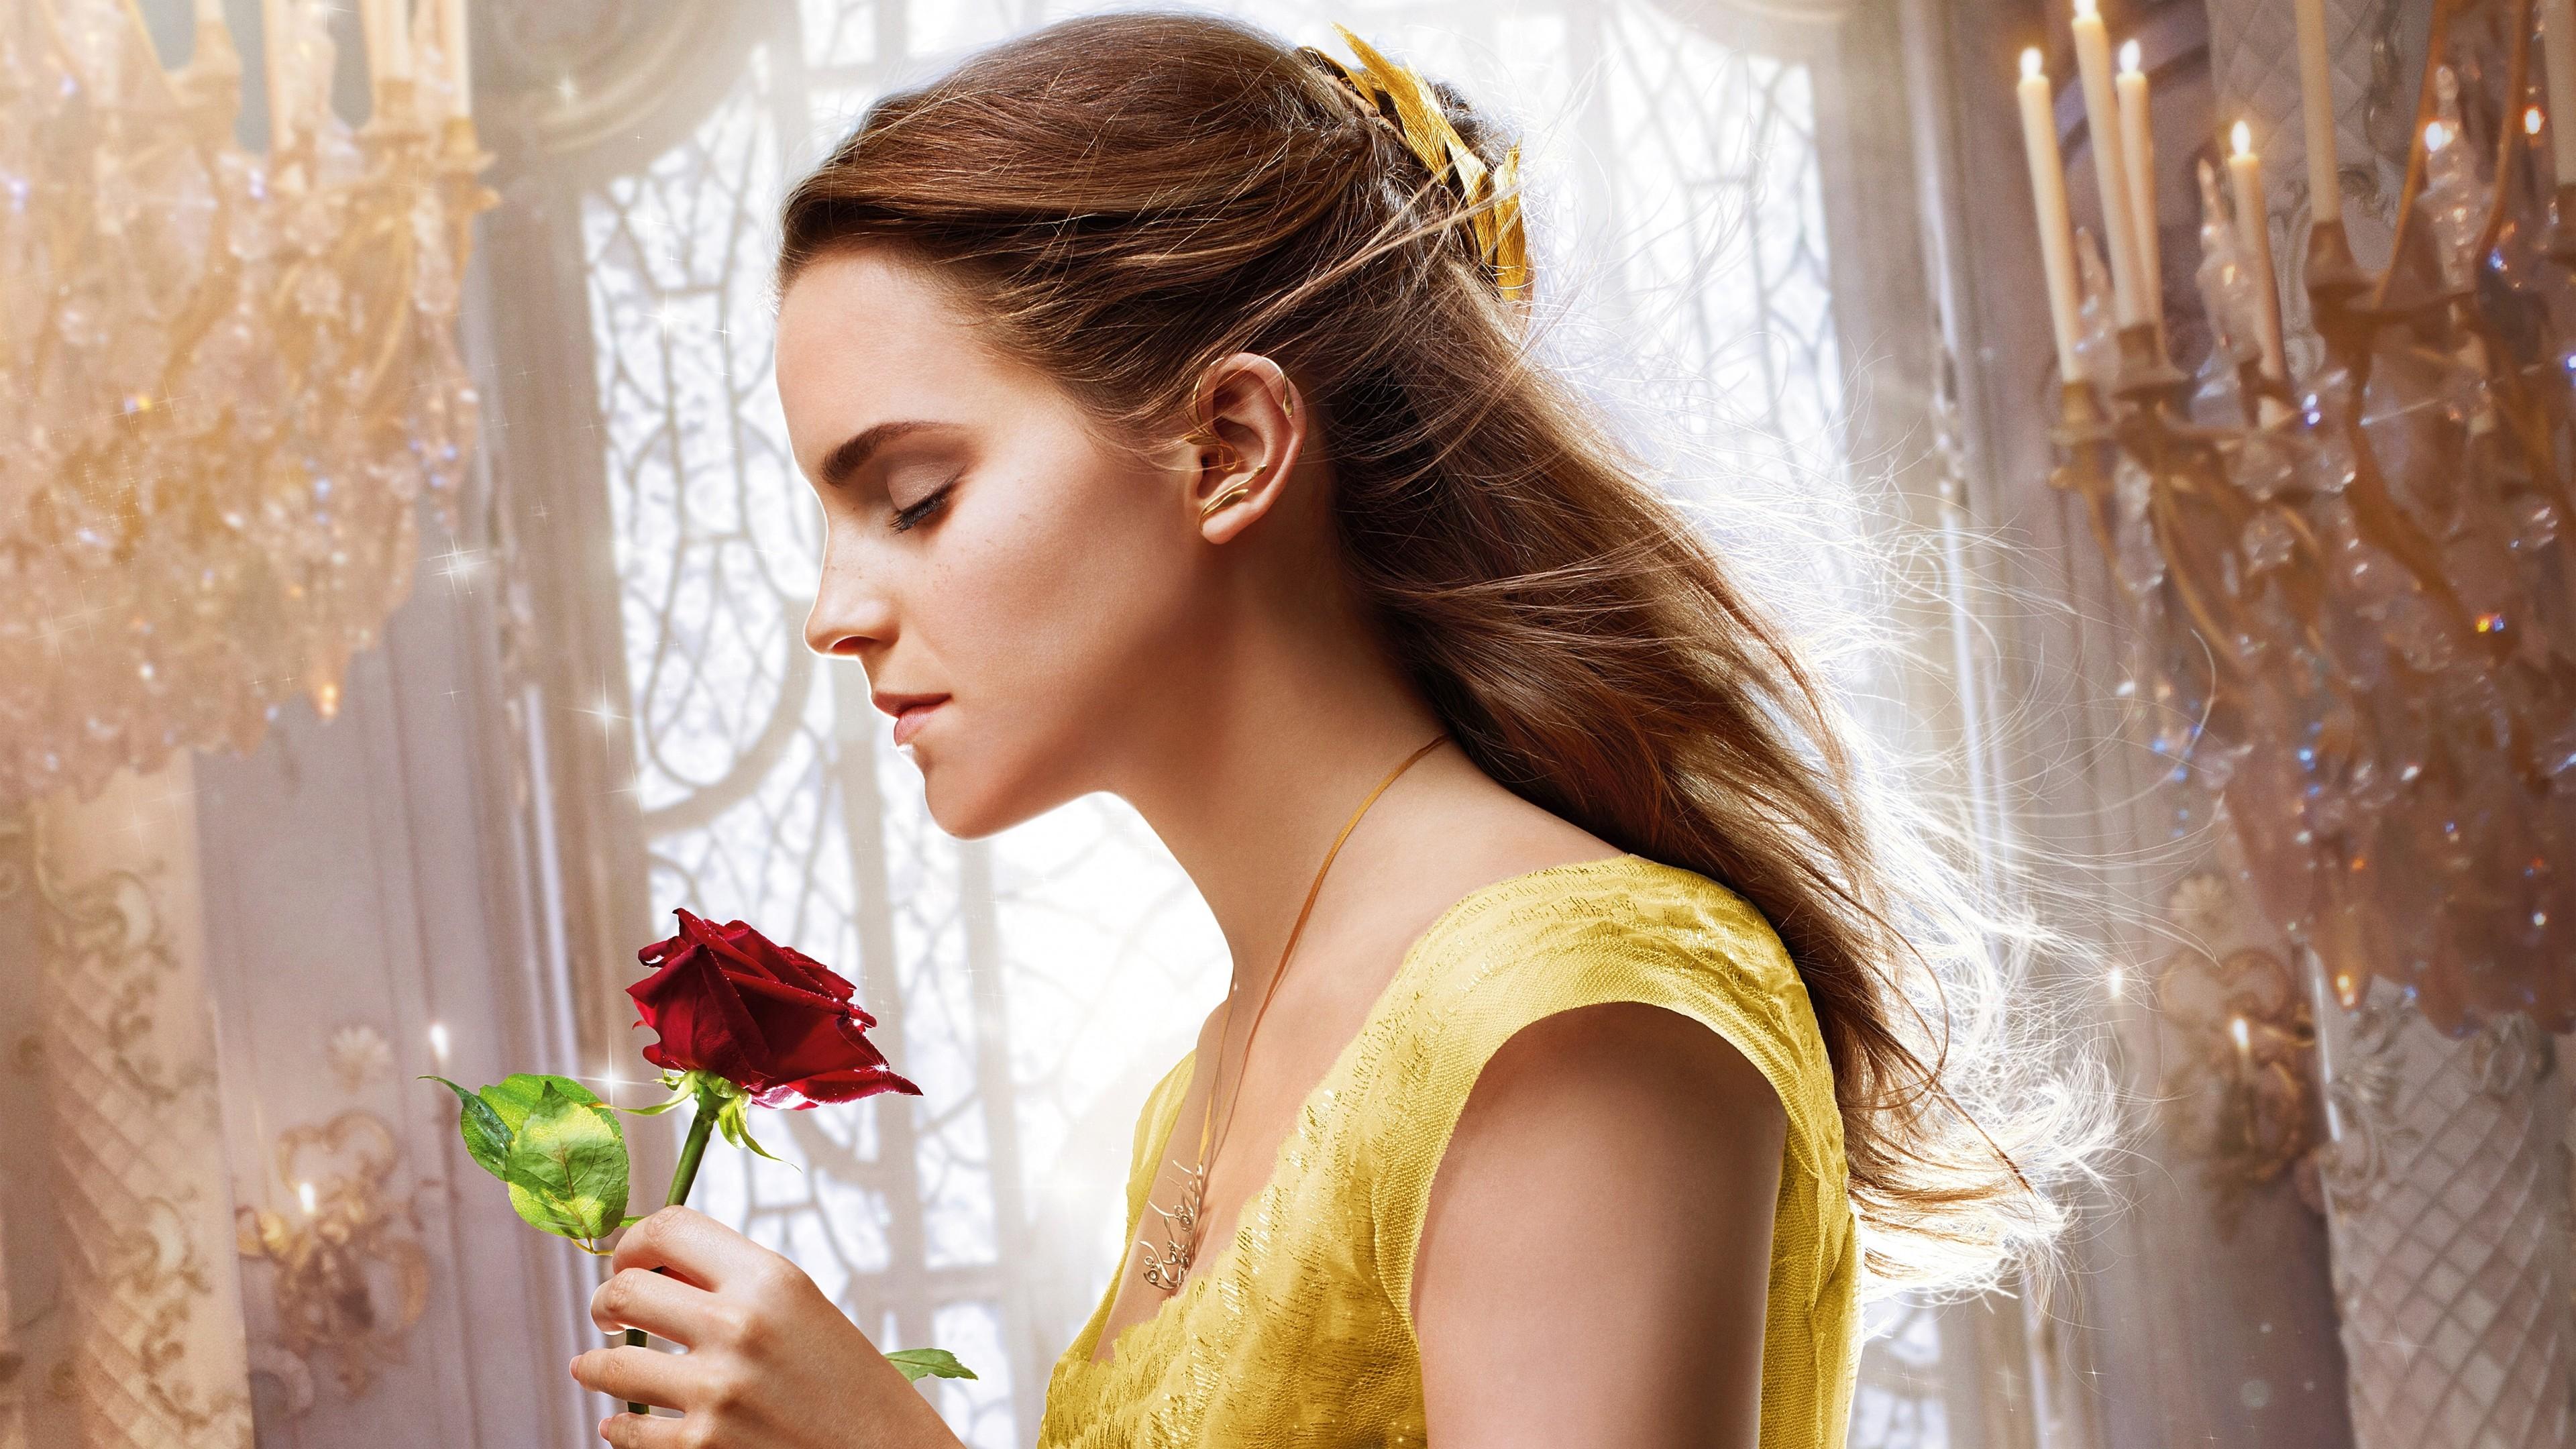 Wallpaper 4k Emma Watson Beauty And The Beast 5k Hd 2017 Movies